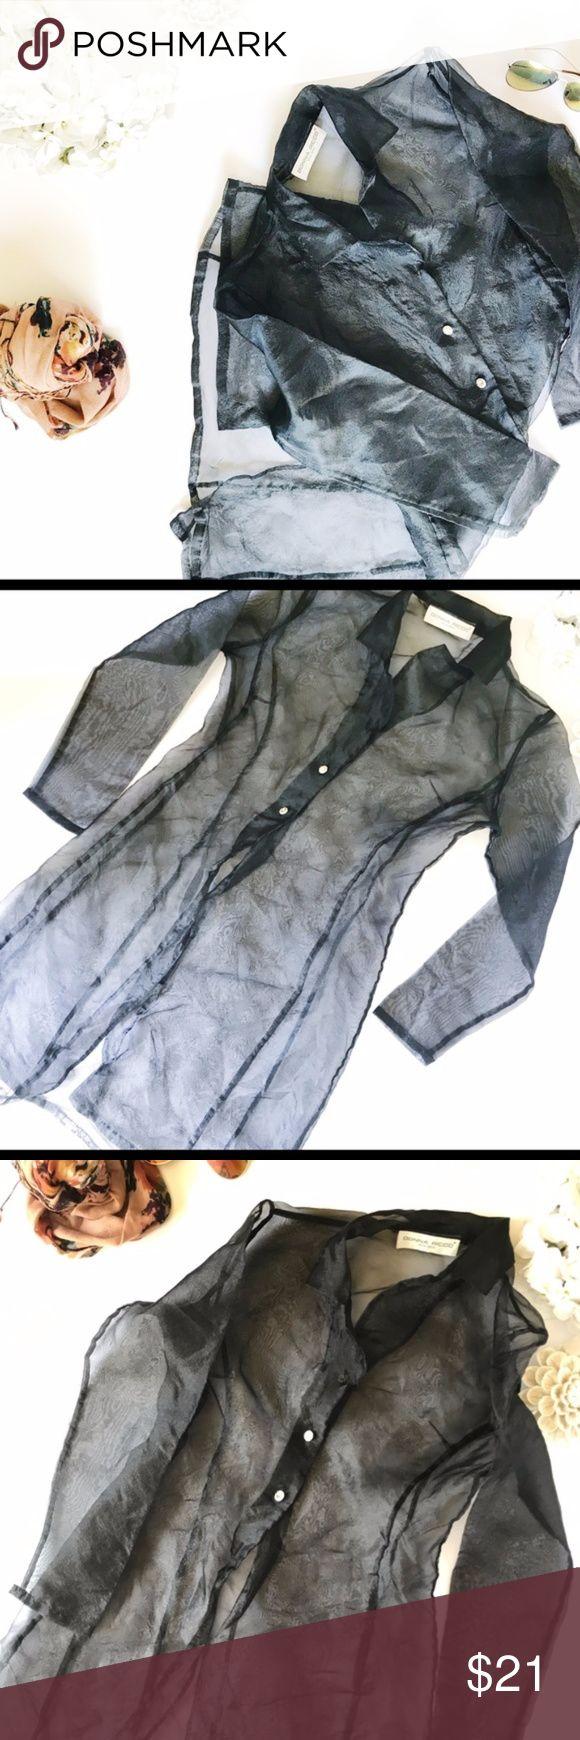 Vintage Donna Ricco Sheer Trench Blouse Vintage Donna Ricco Sheer Trench Blouse L:36 w:14 Donna Ricco Jackets & Coats